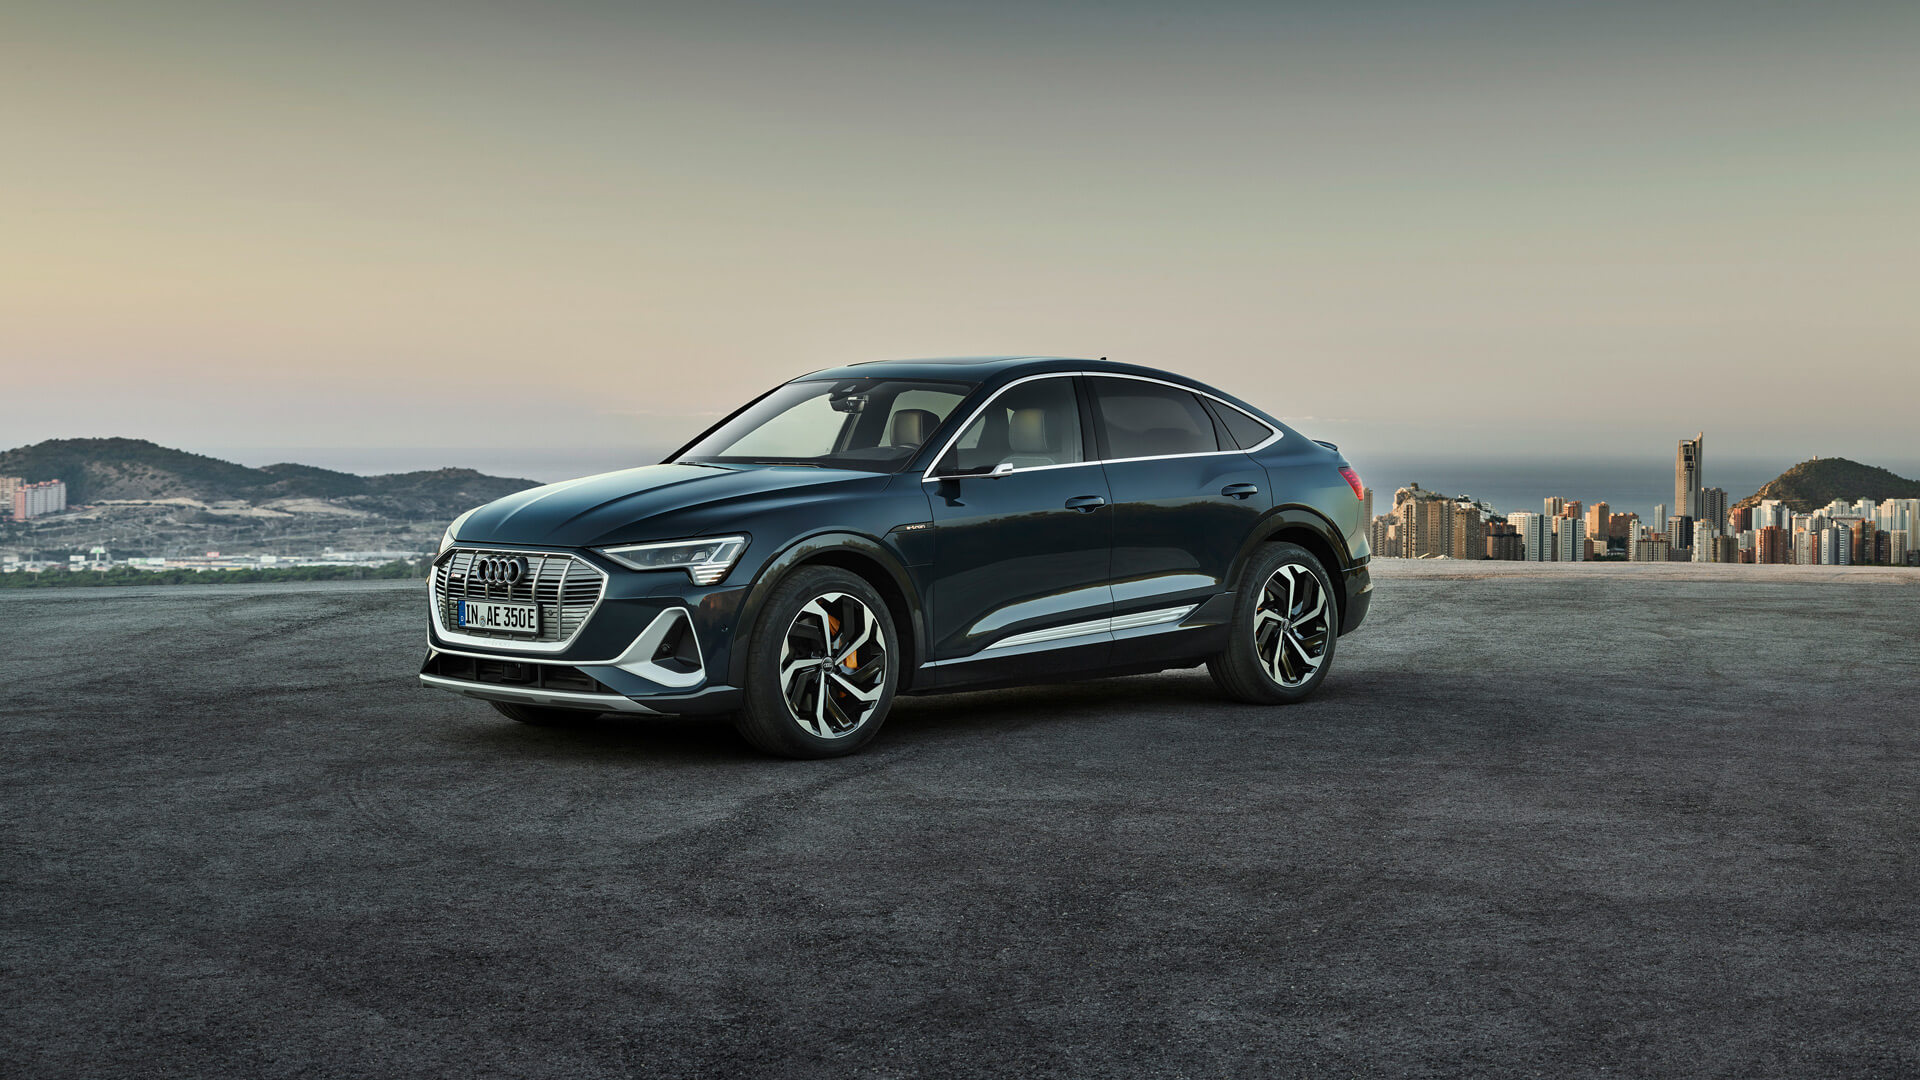 Фотография экоавто Audi e-tron Sportback 50 quattro - фото 5